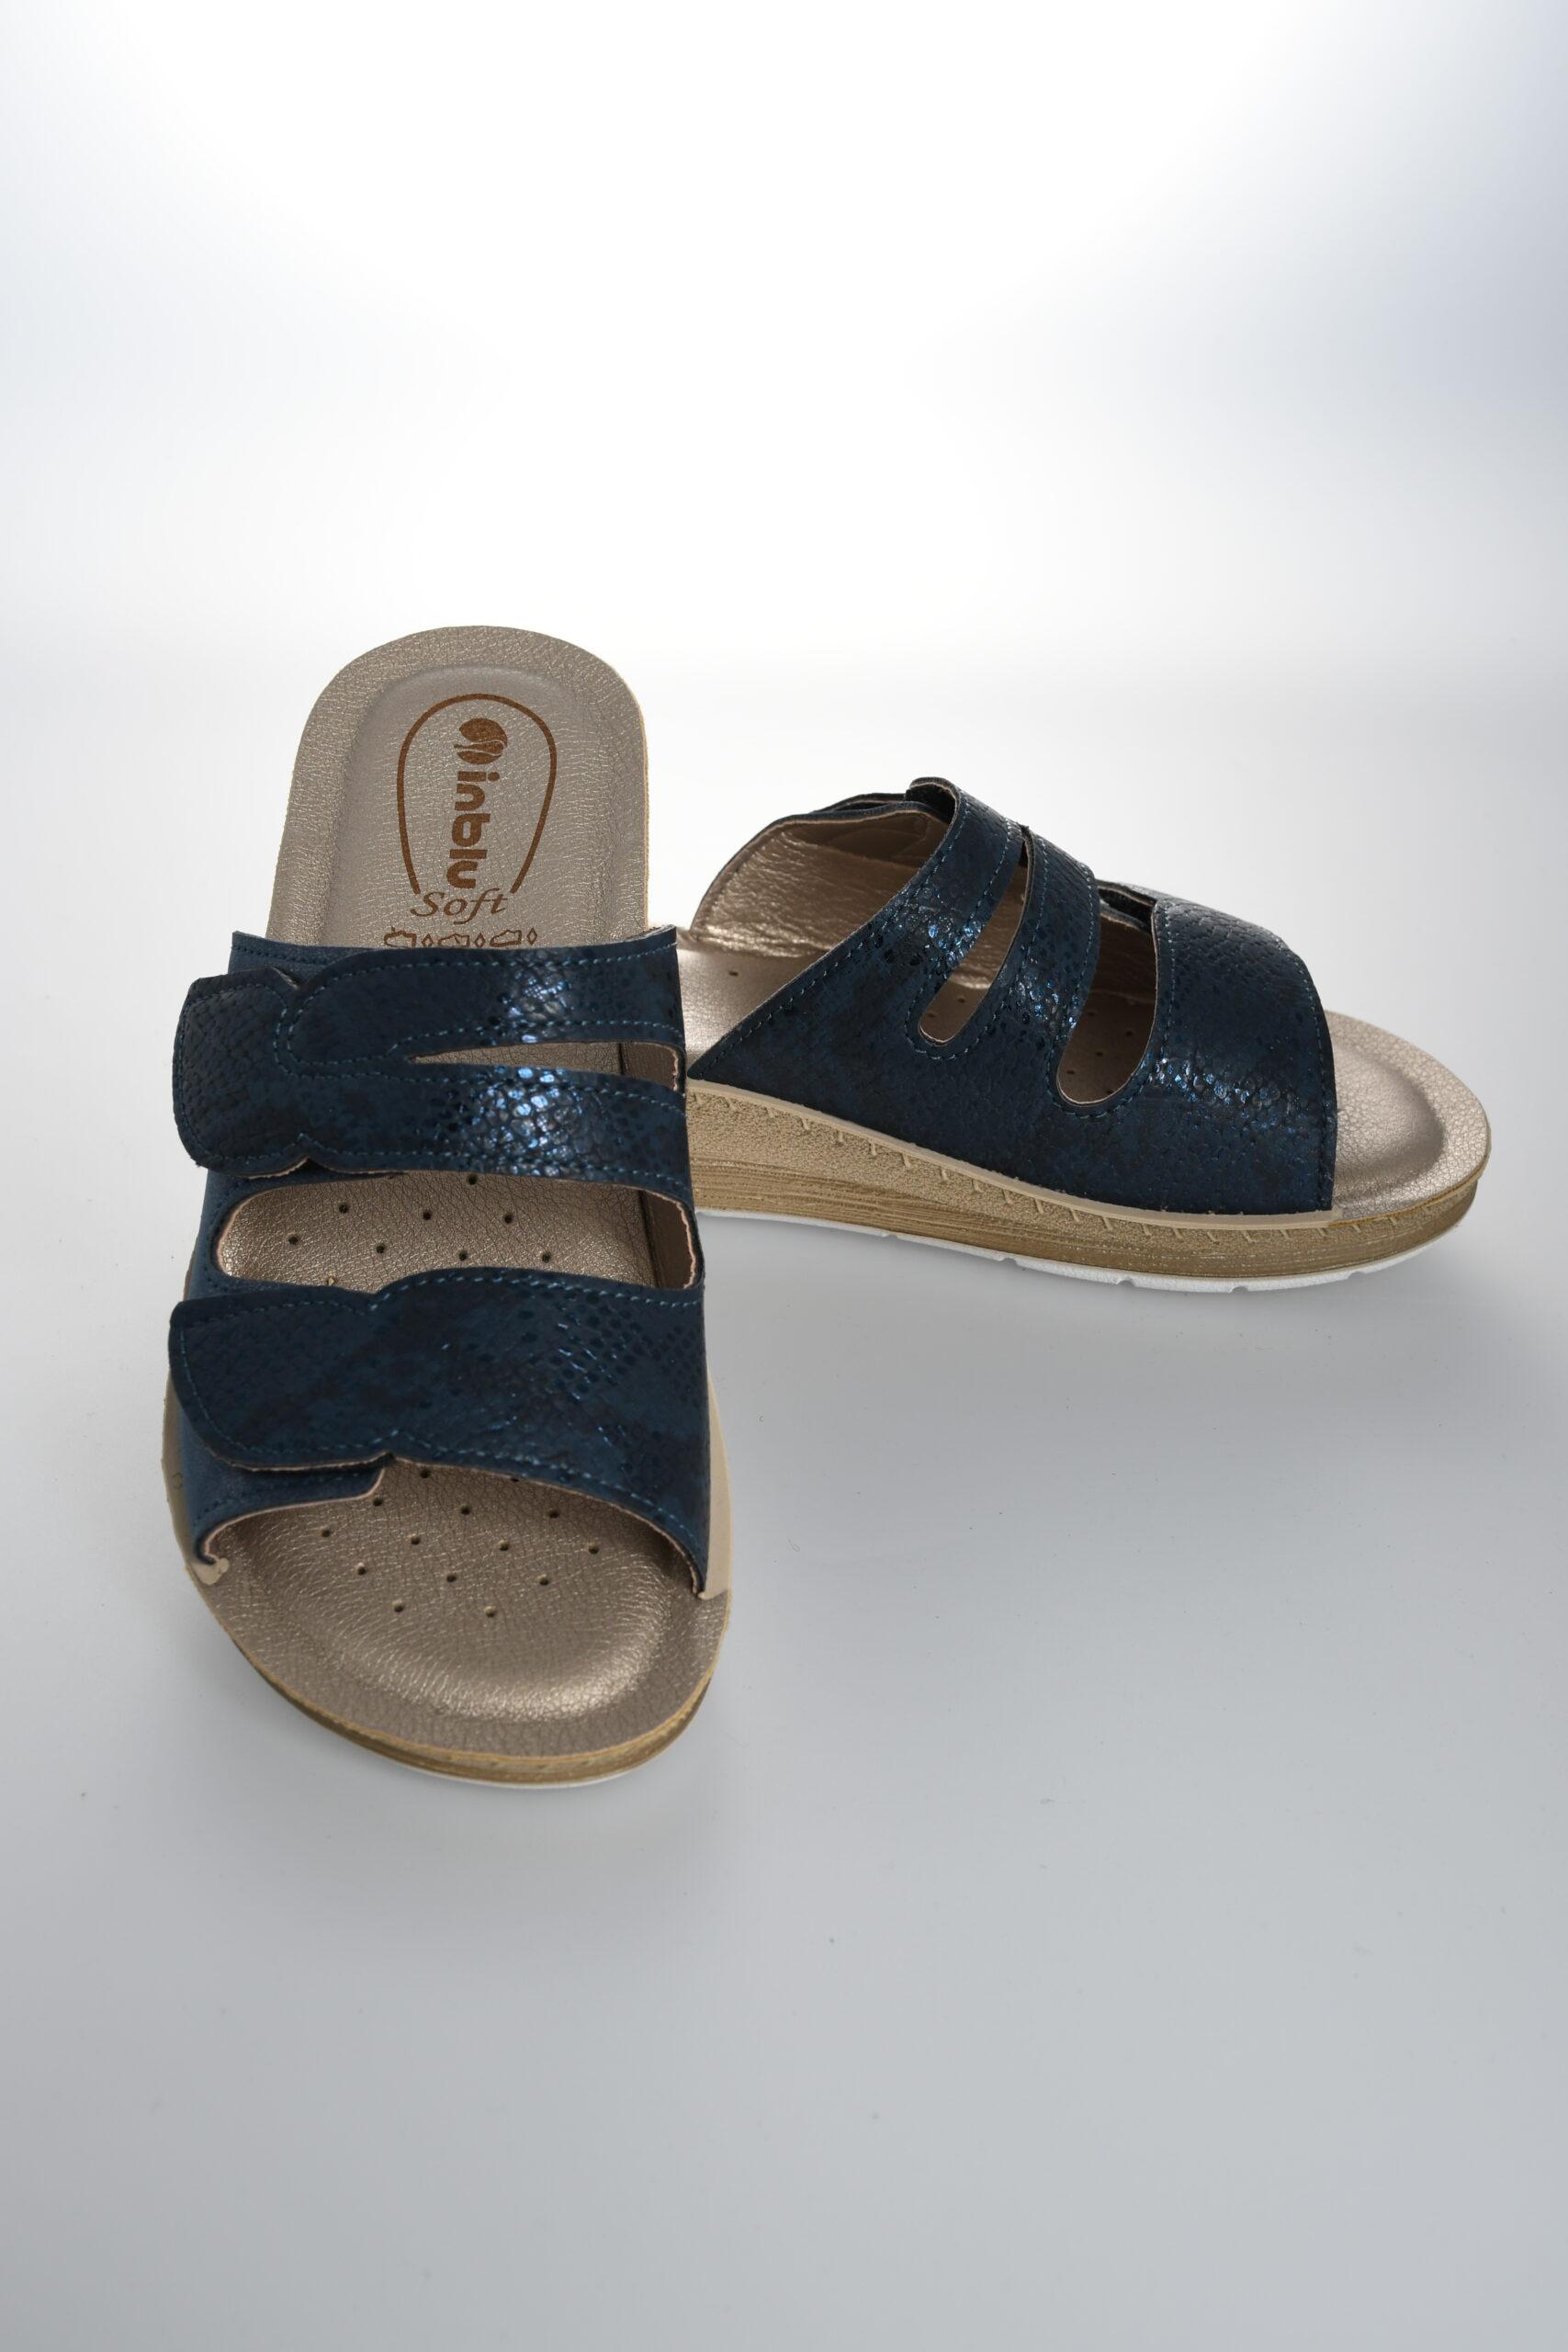 Sandal Inblu